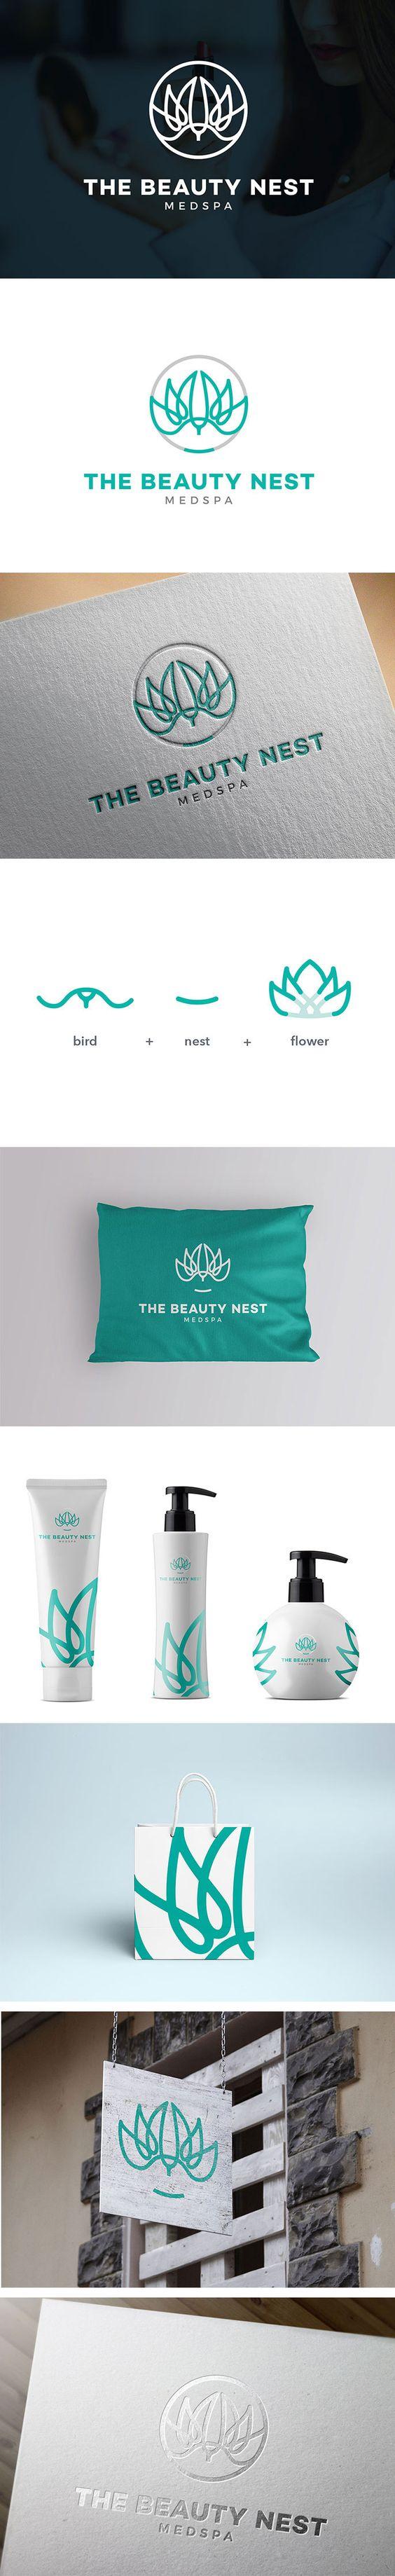 MedSpa Logo Design, Beauty Nest Brand Identity   Spa, Beauty, Clinic, Medical, Bird, Wing, Nest, Mark, Circle   The Beauty Nest MedSPa, Las Vegas US   Celine Le Duigou, Freelance Graphic Designer Perth Australia